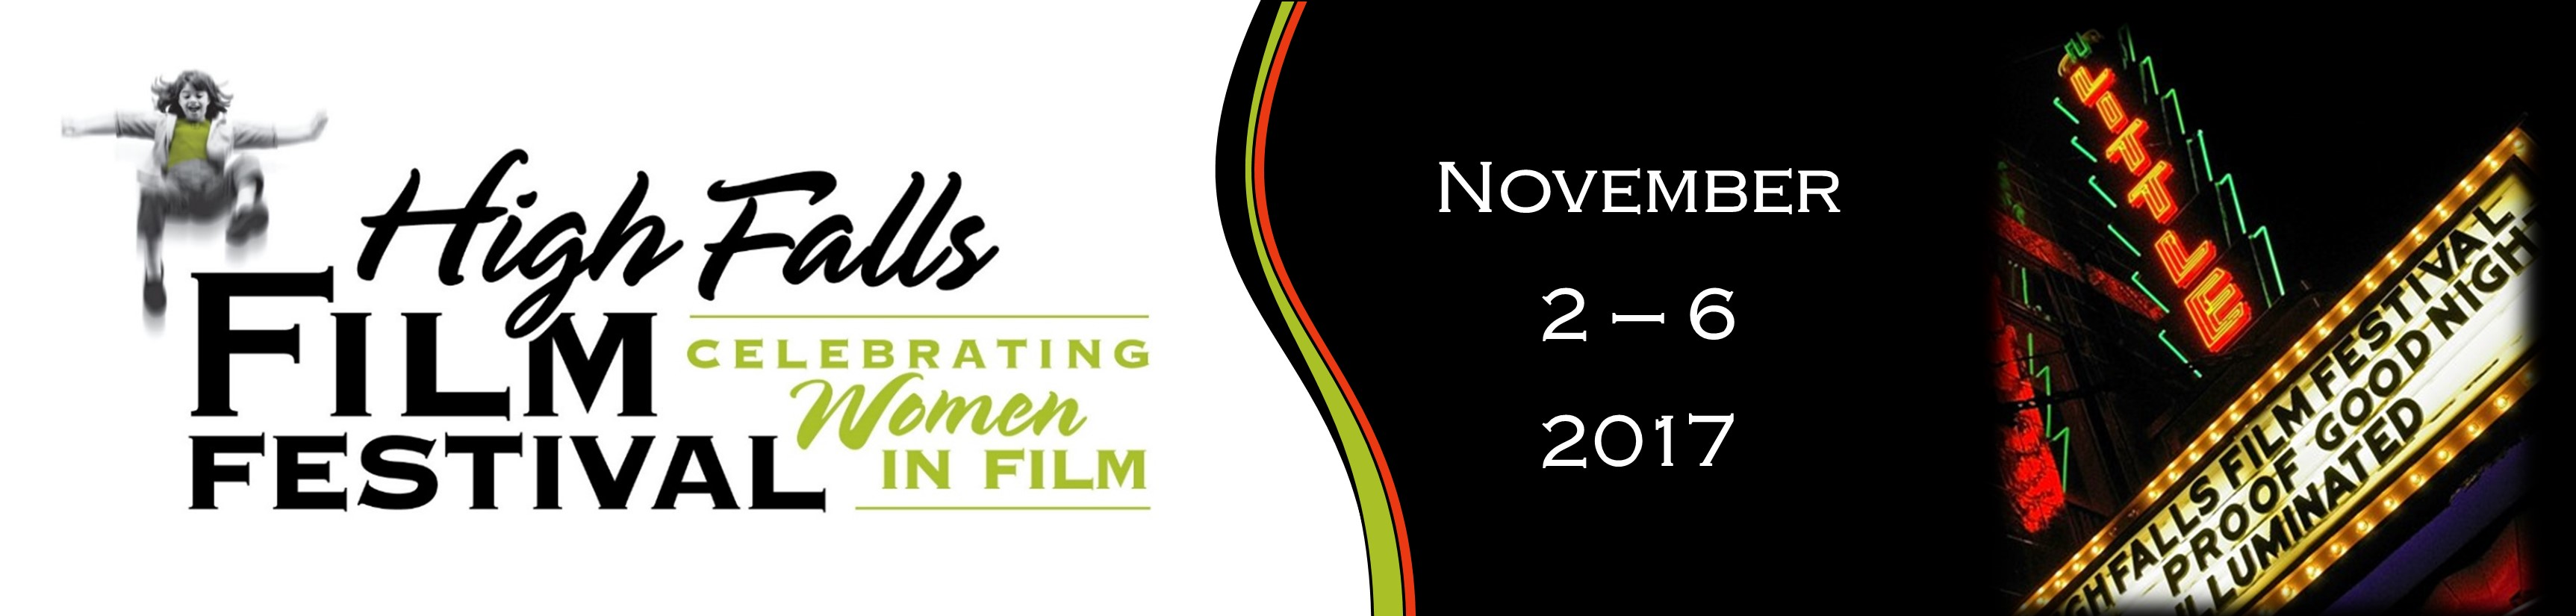 2016 High Falls Film Festival